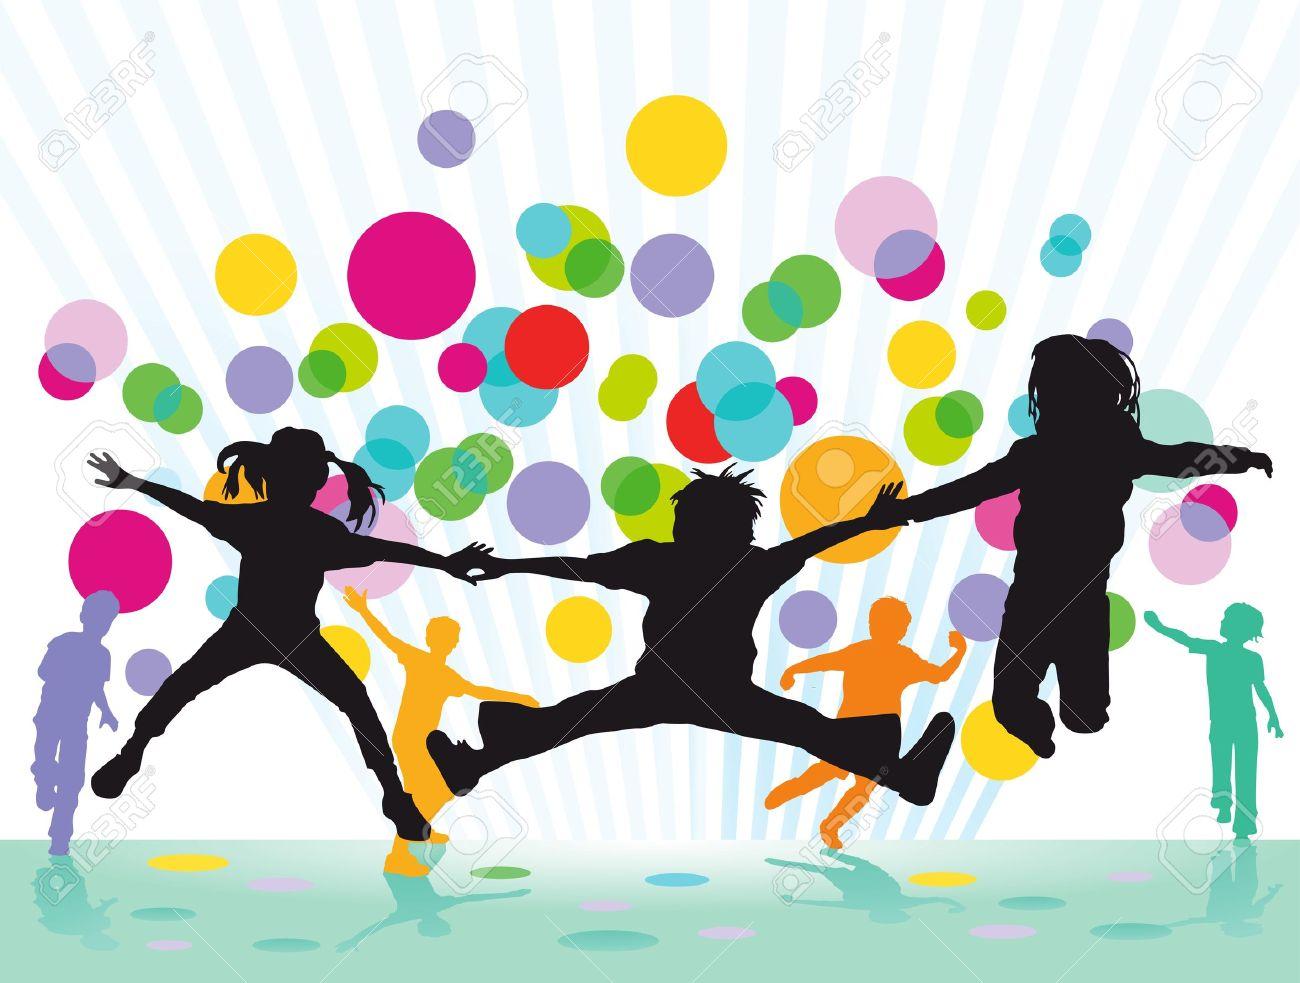 festival-niños-coloridos-s